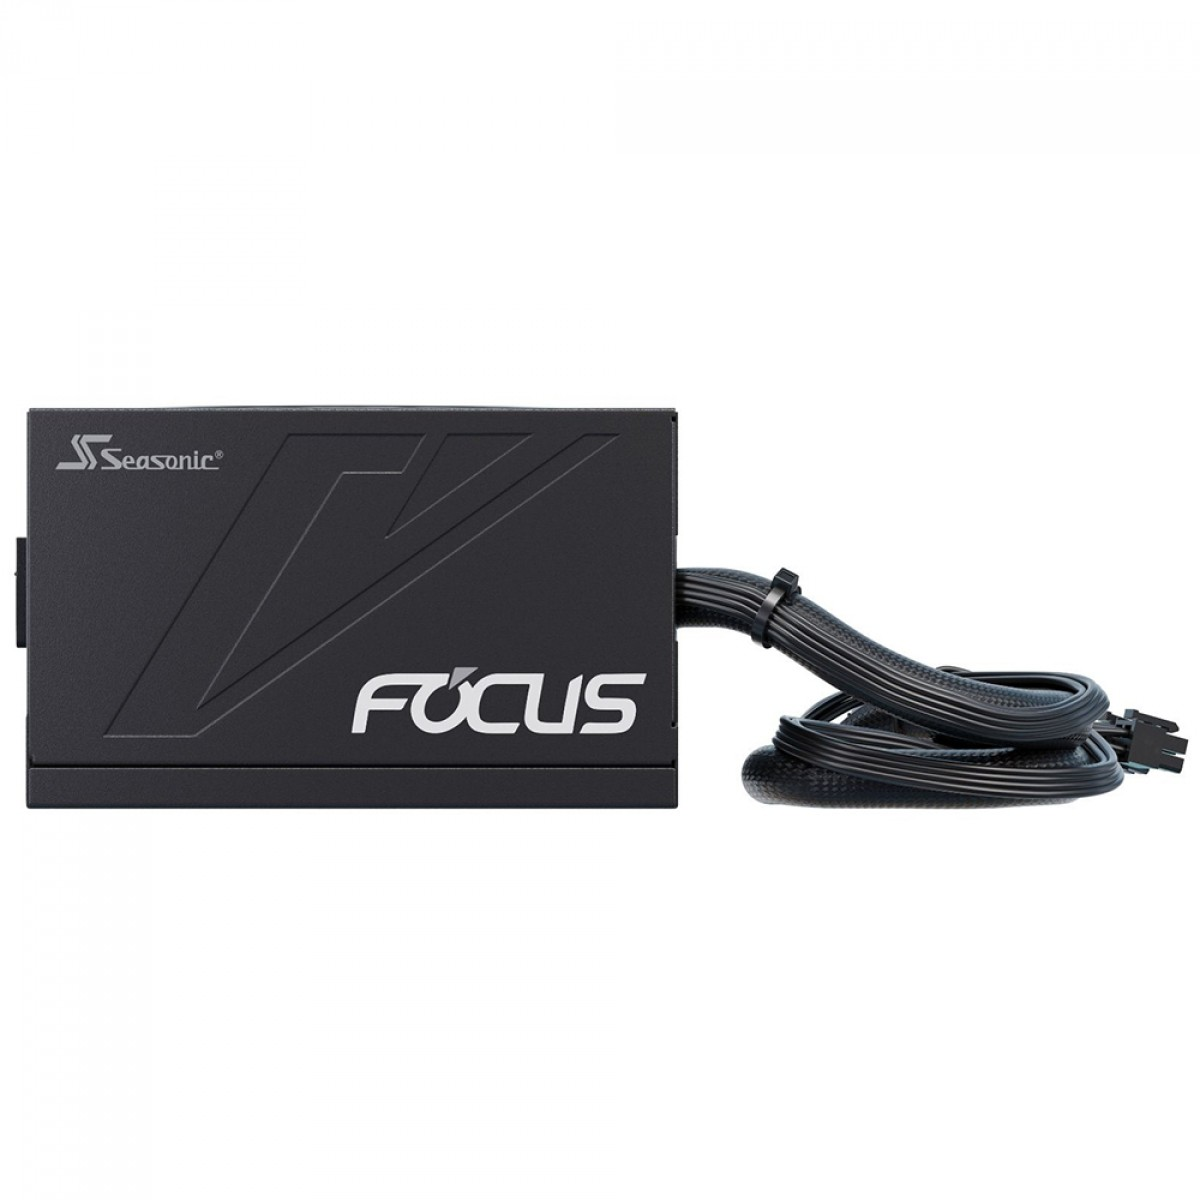 Fonte Seasonic Focus GM-850, 850W, 80 Plus Gold, Semi Modular